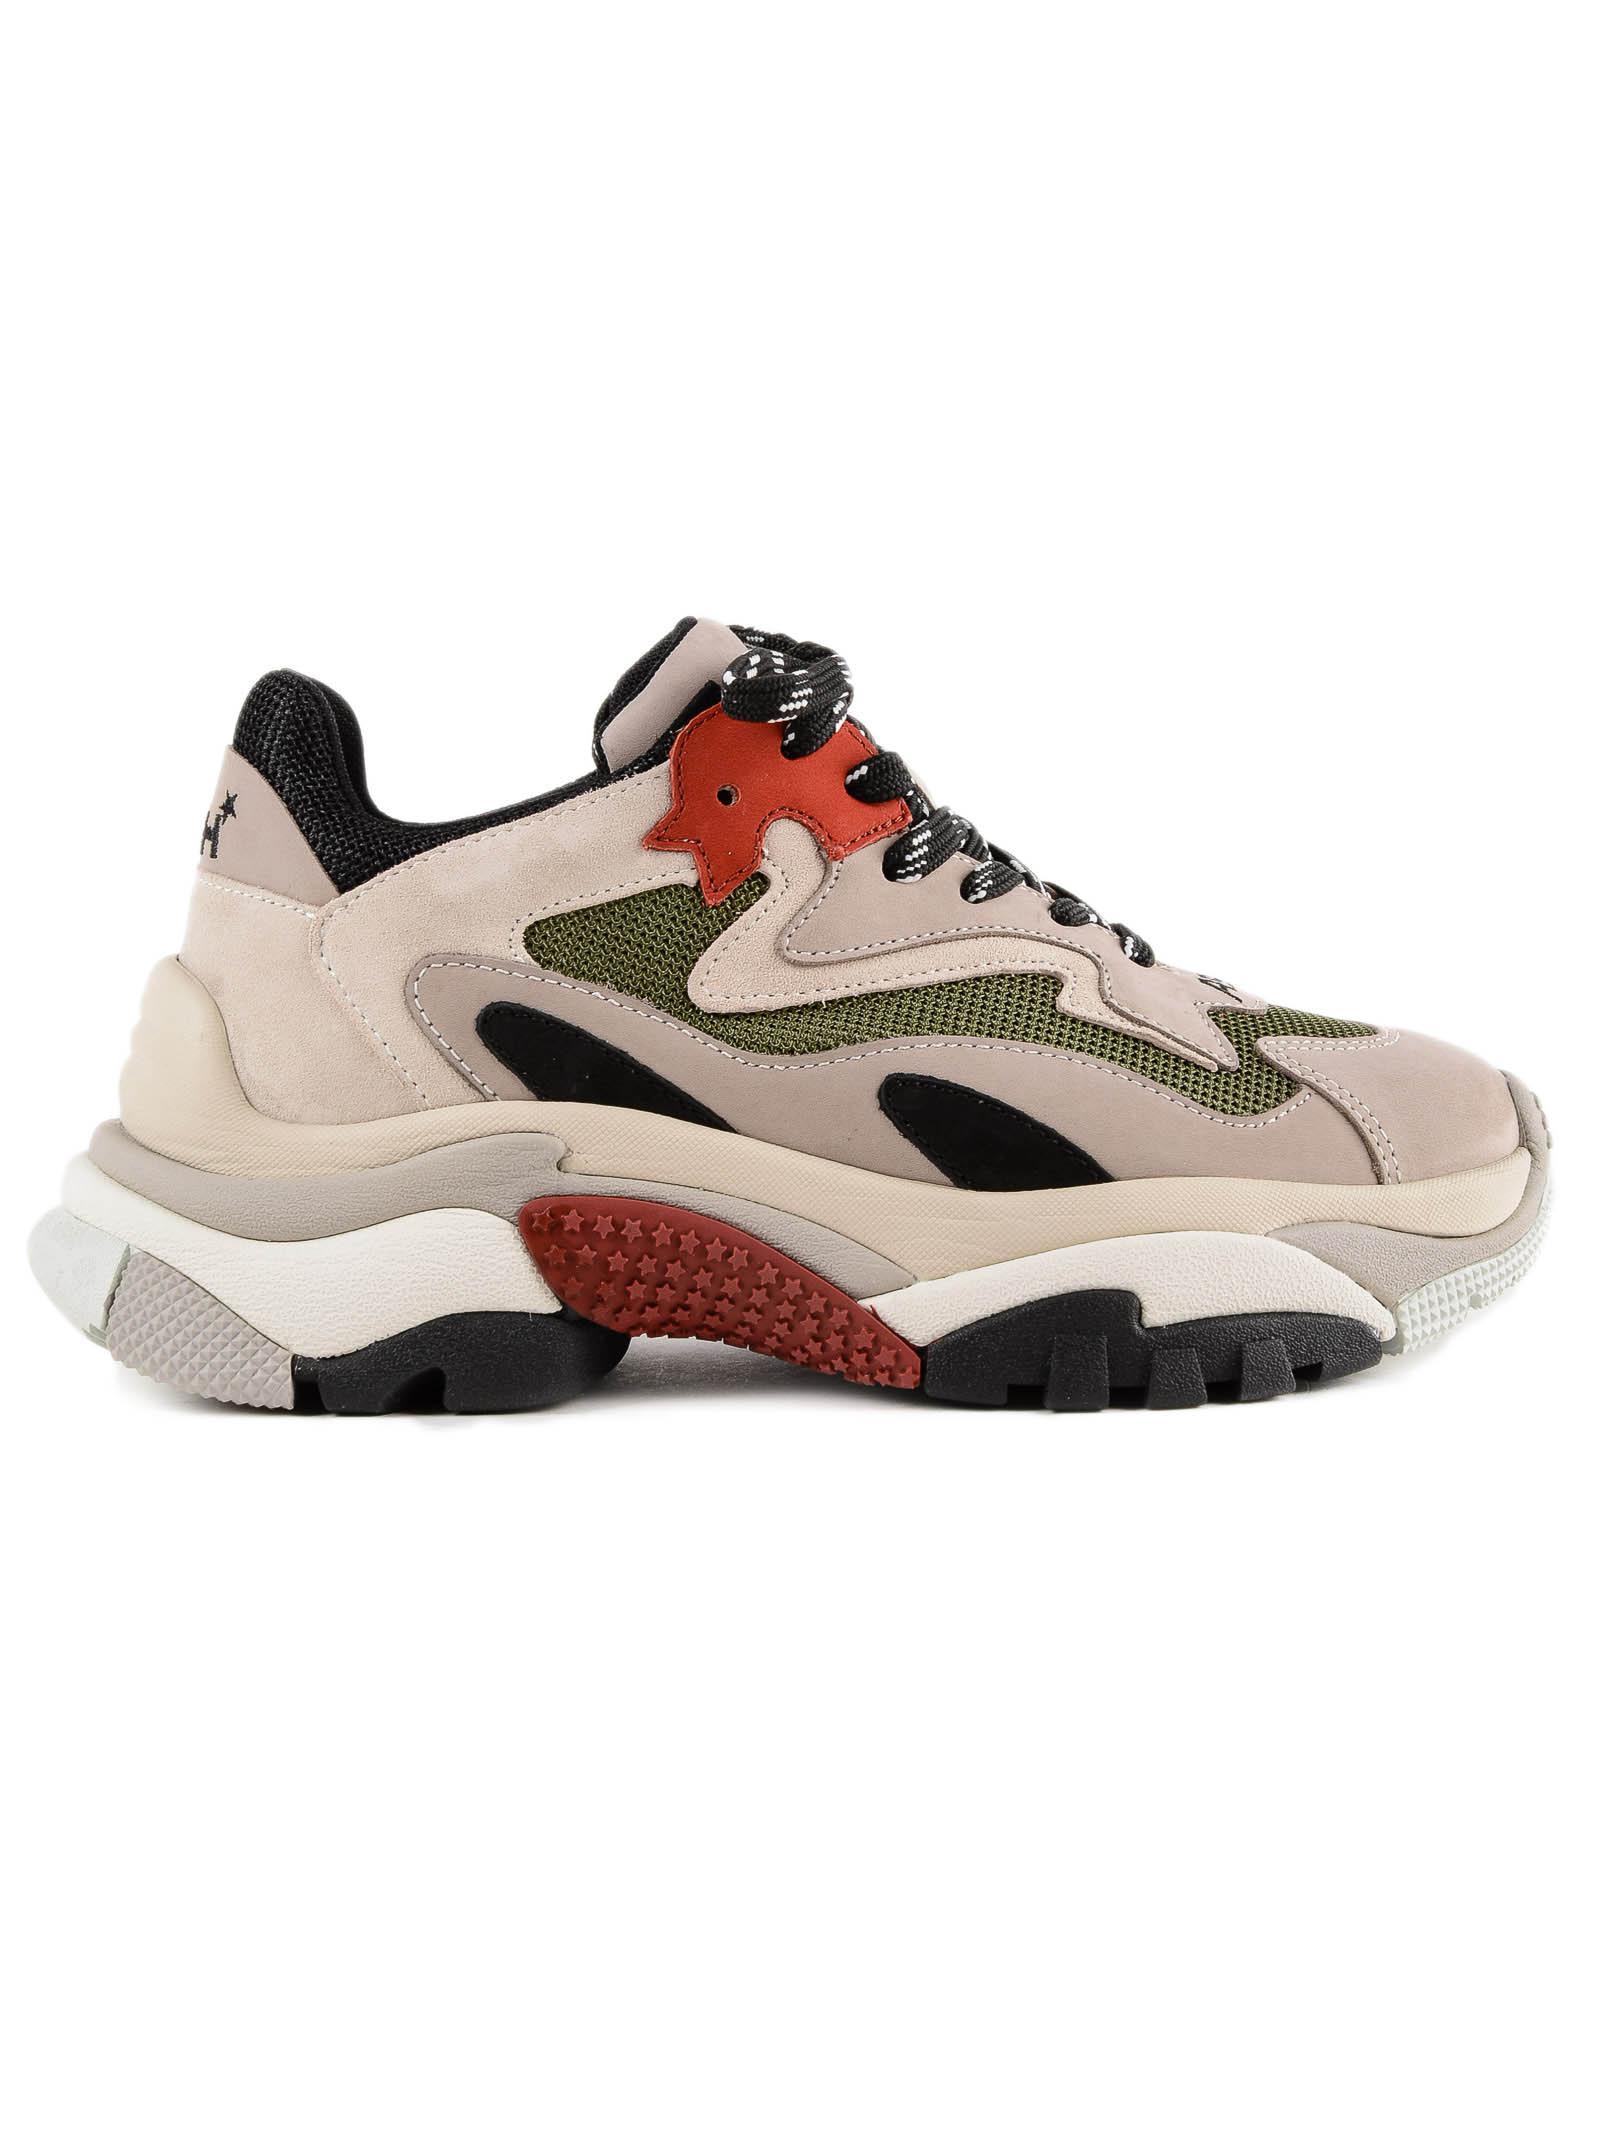 34c43925cfe8 Lyst - Ash Sneakers Nappa Calf in Gray